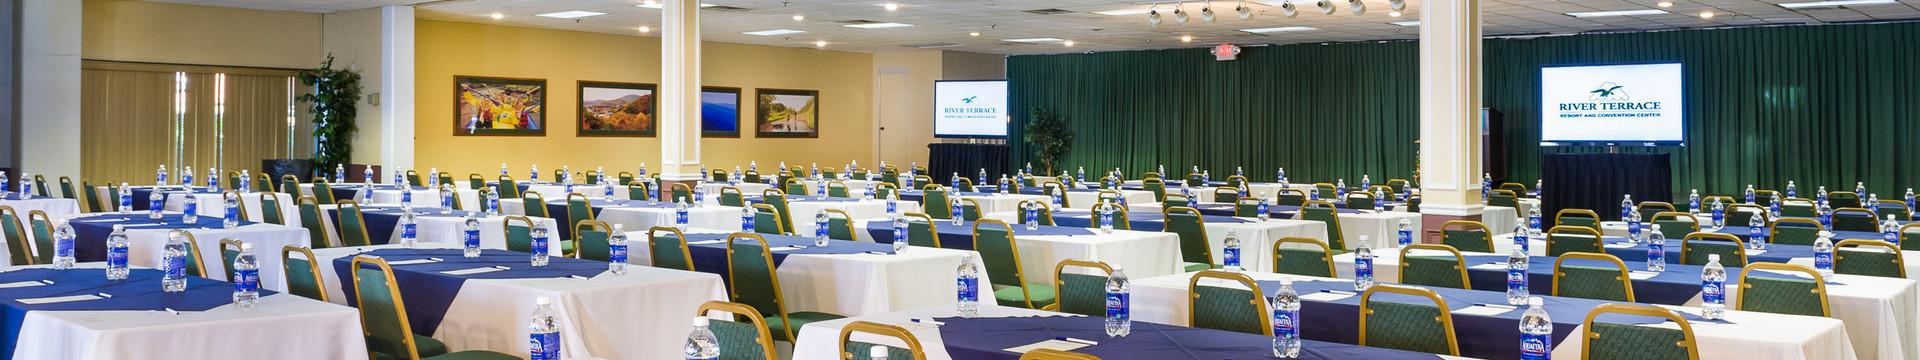 A Unique Class Reunion Idea For Groups Near Orlando | Westgate River Ranch